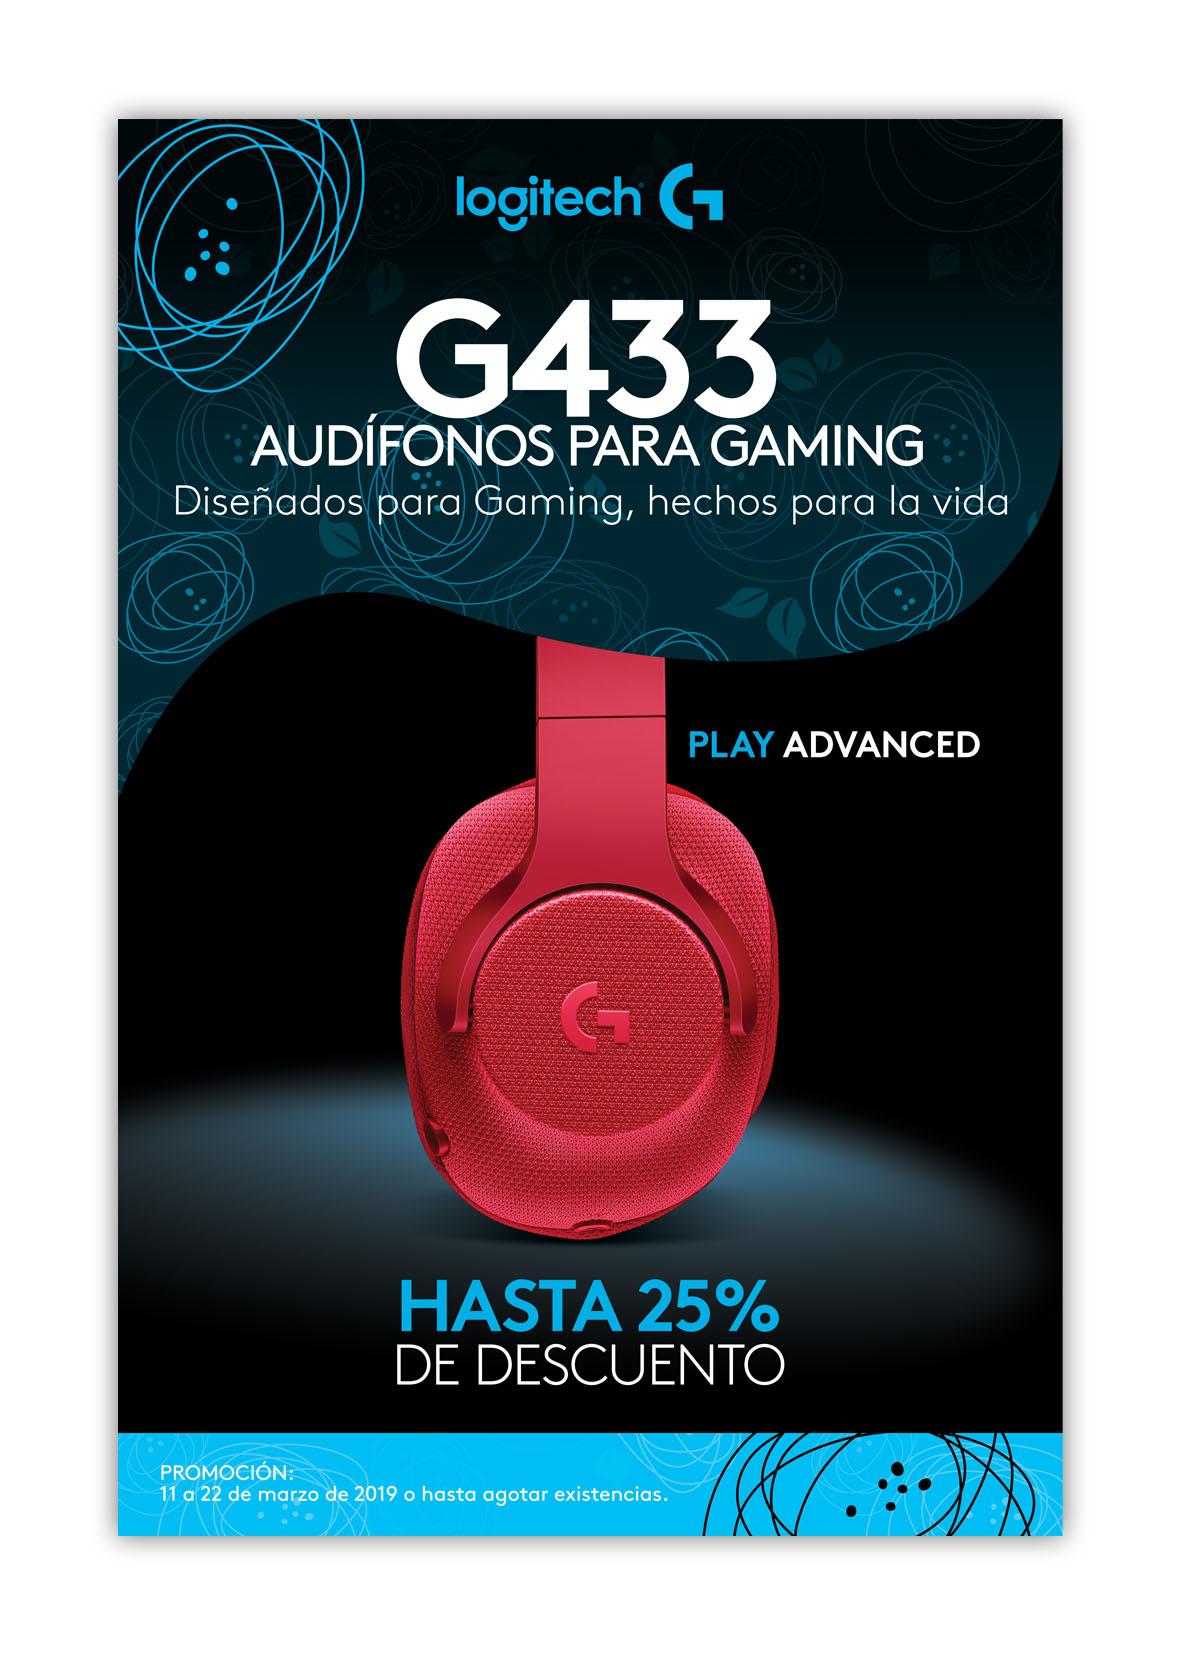 Poster Marzo G433 Rojo 32x48cm MUESTRA